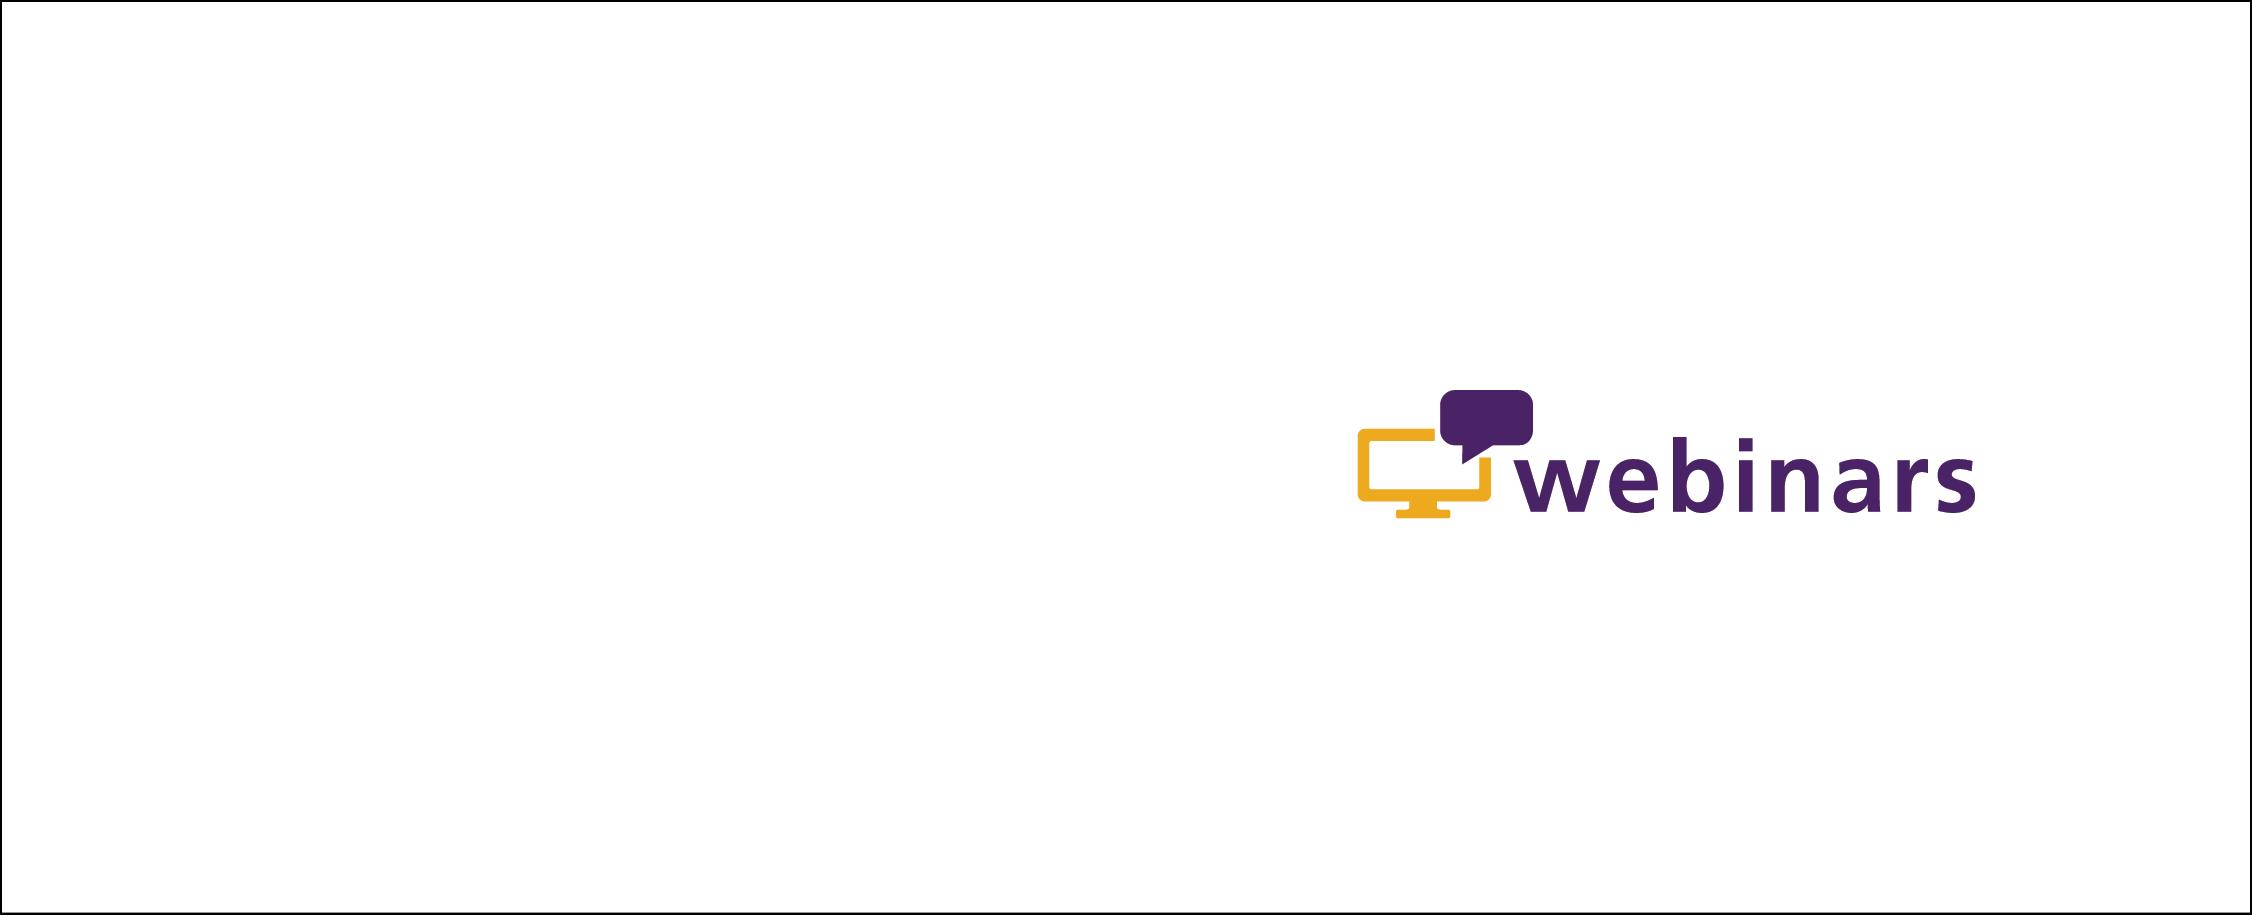 CBGI webinars logo